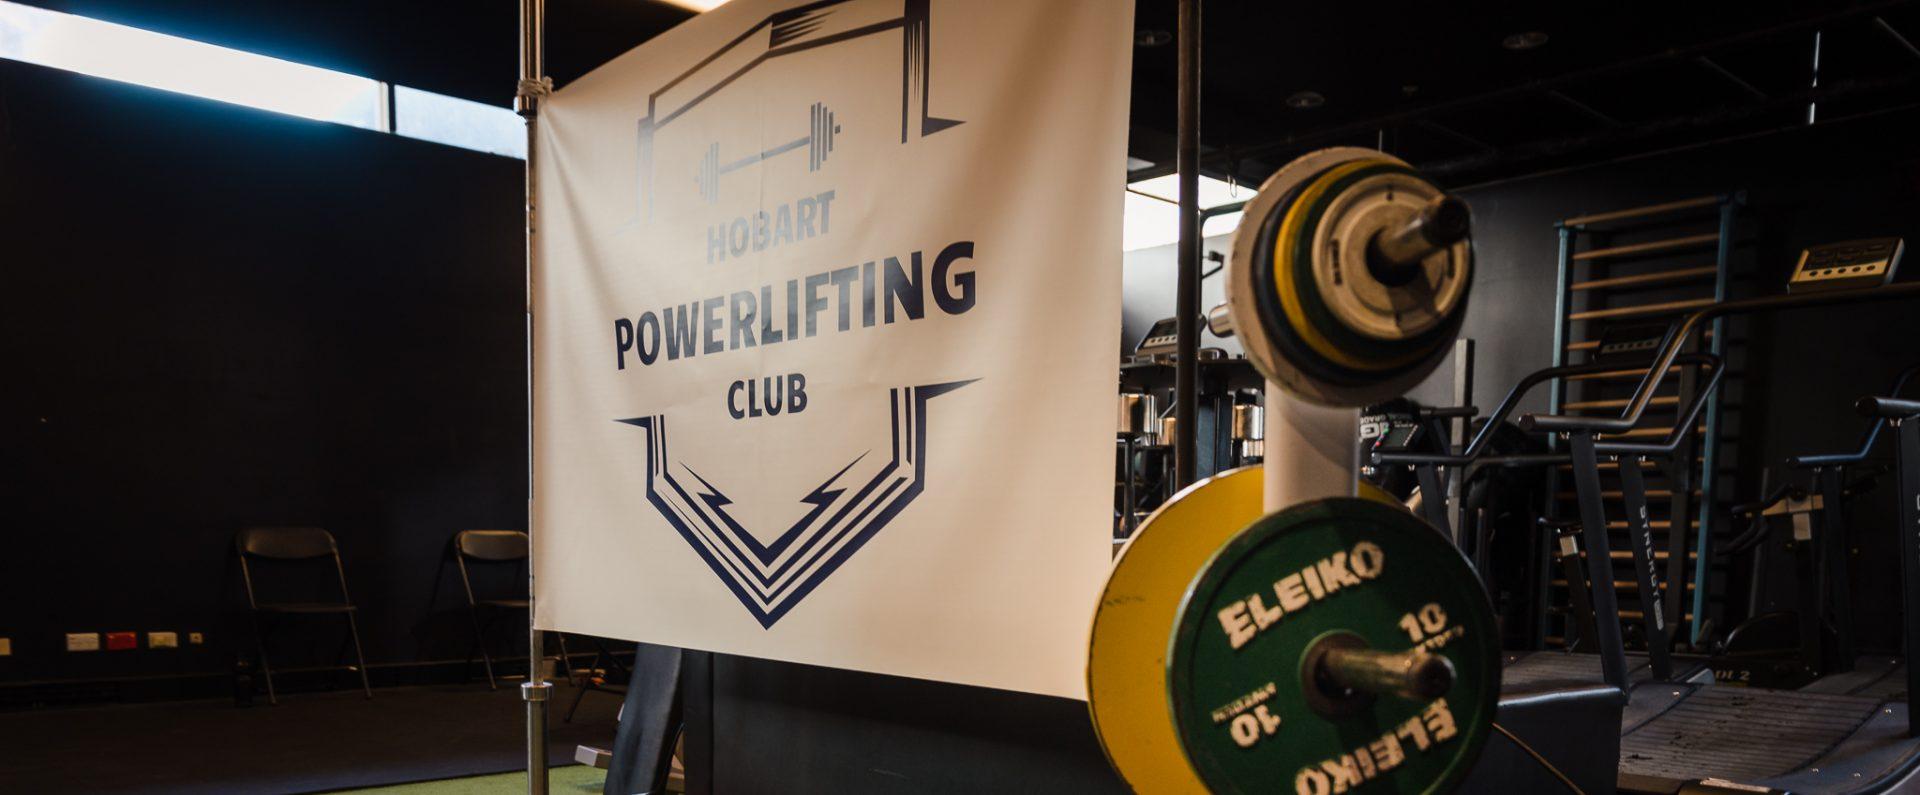 Hobart Powerlifting Club